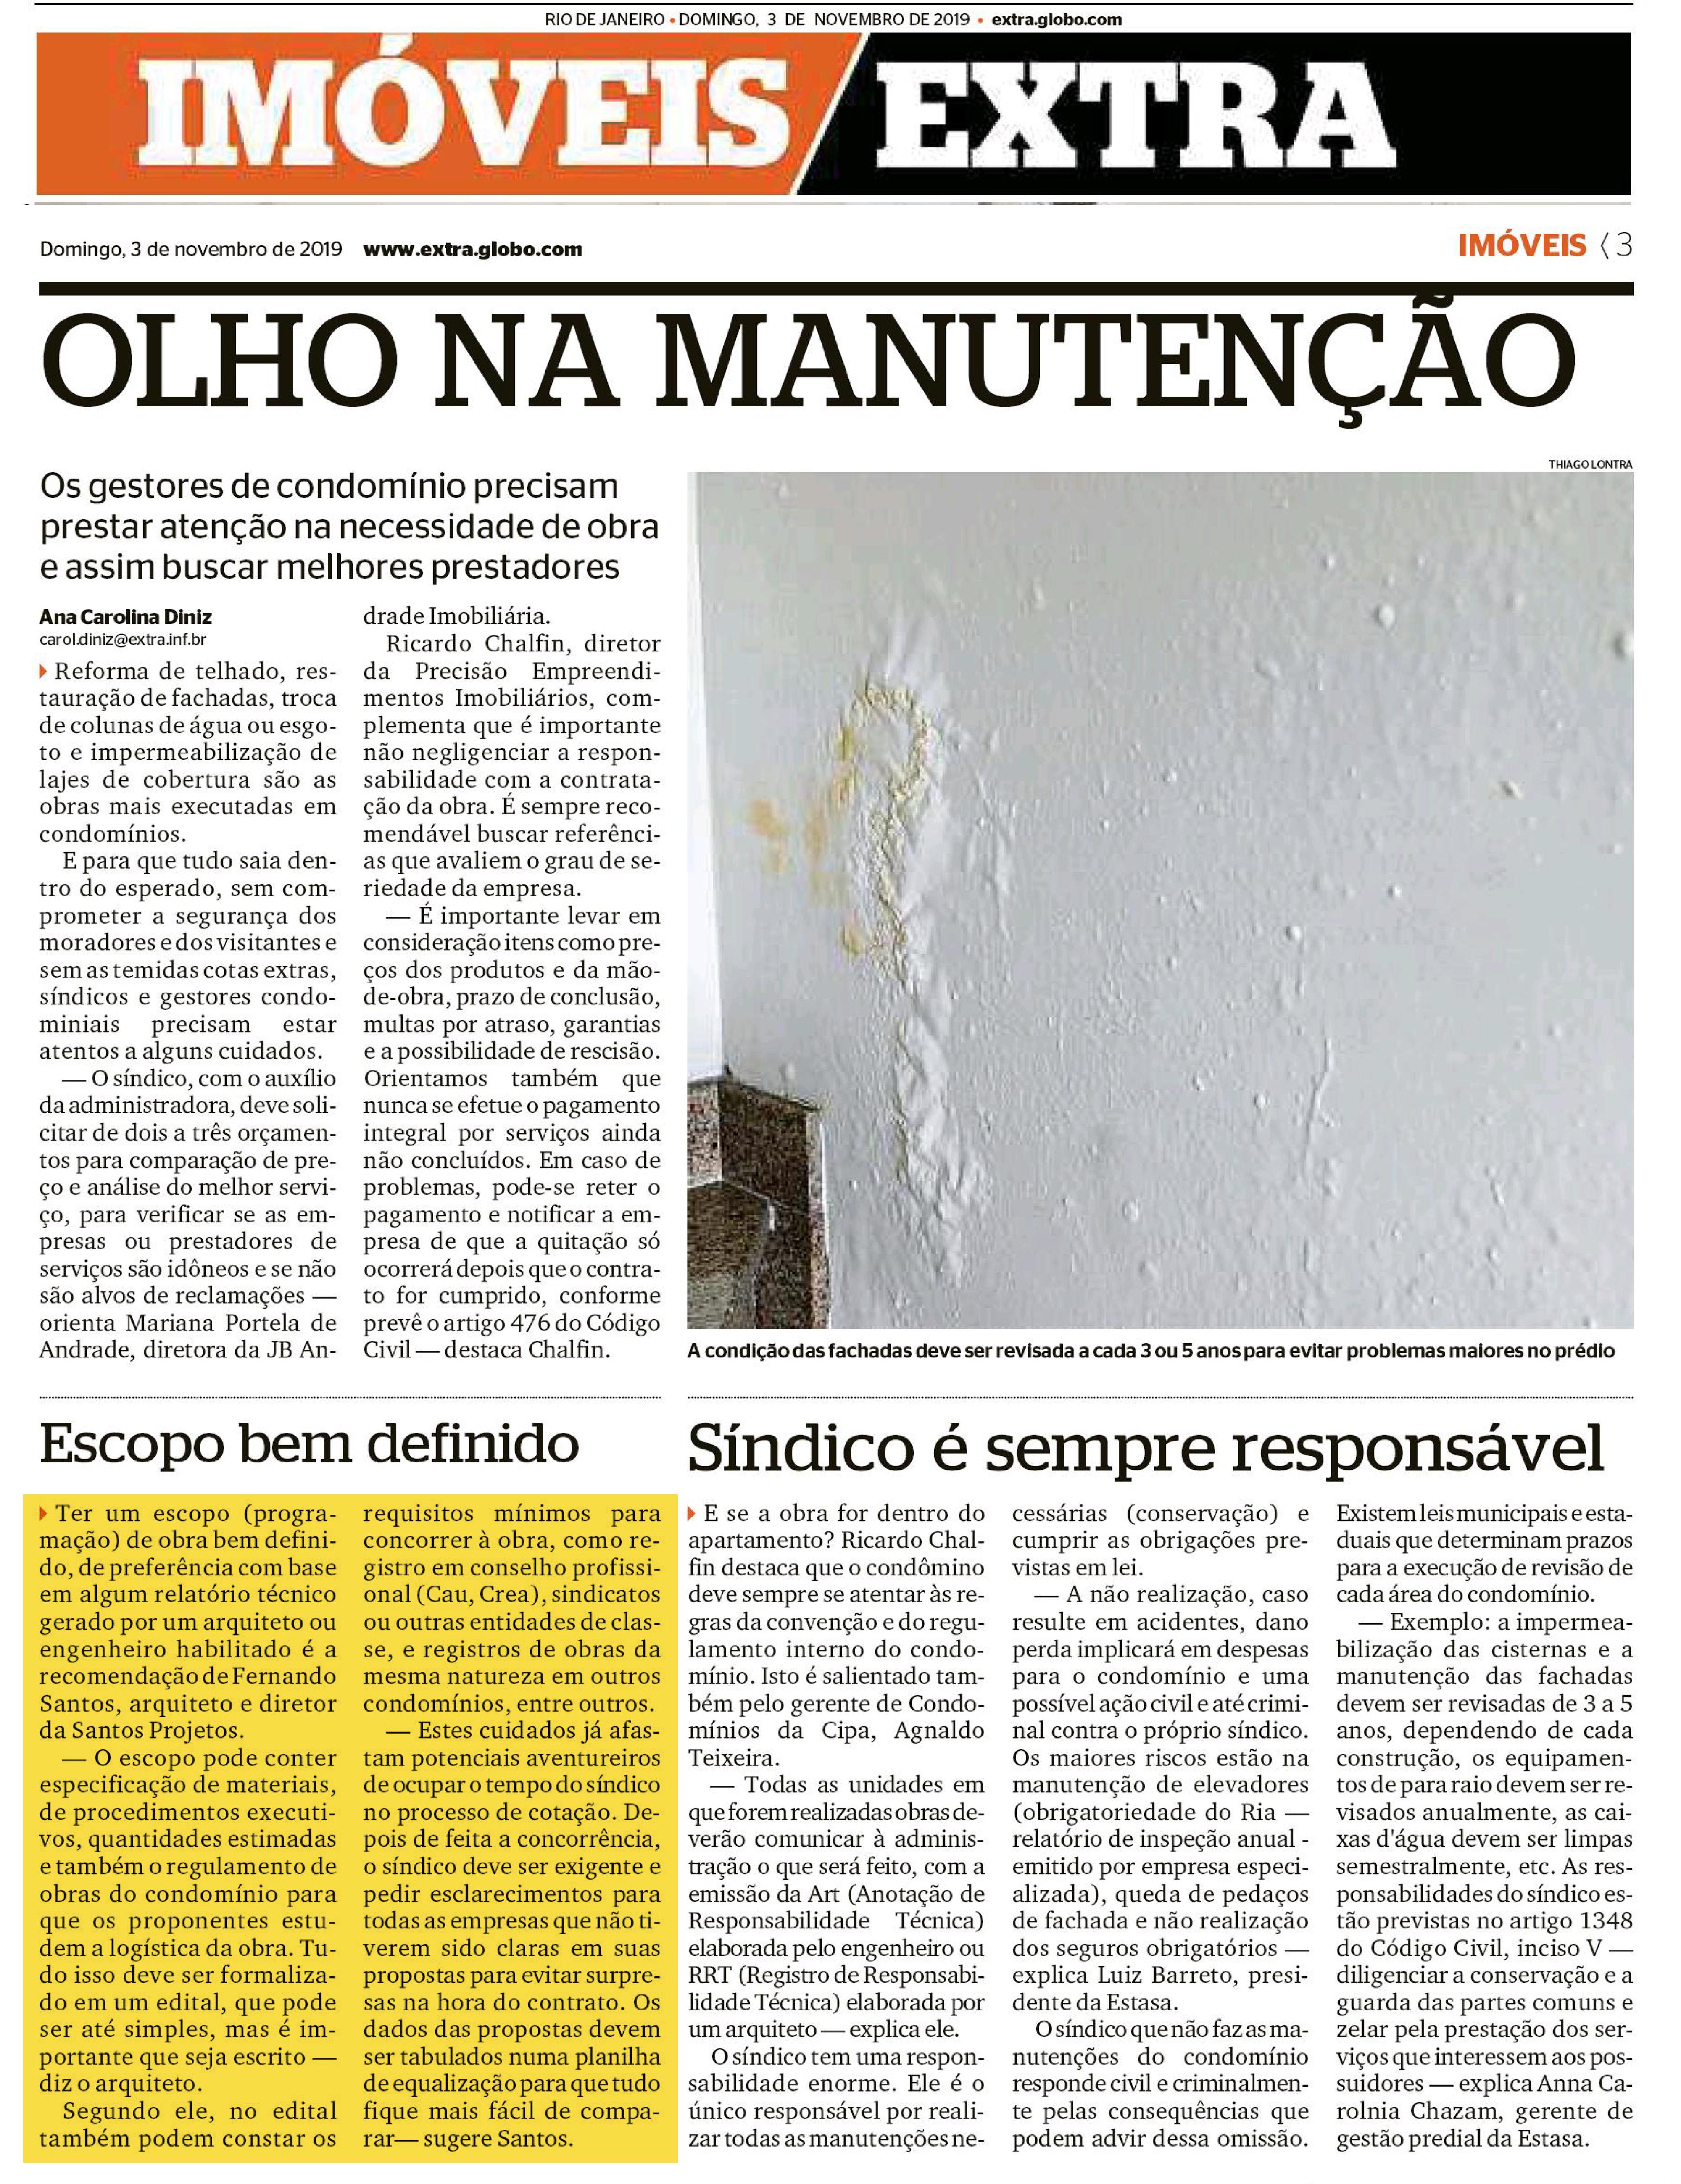 Jornal Extra (caderno Imóveis) – Olho na manutenção